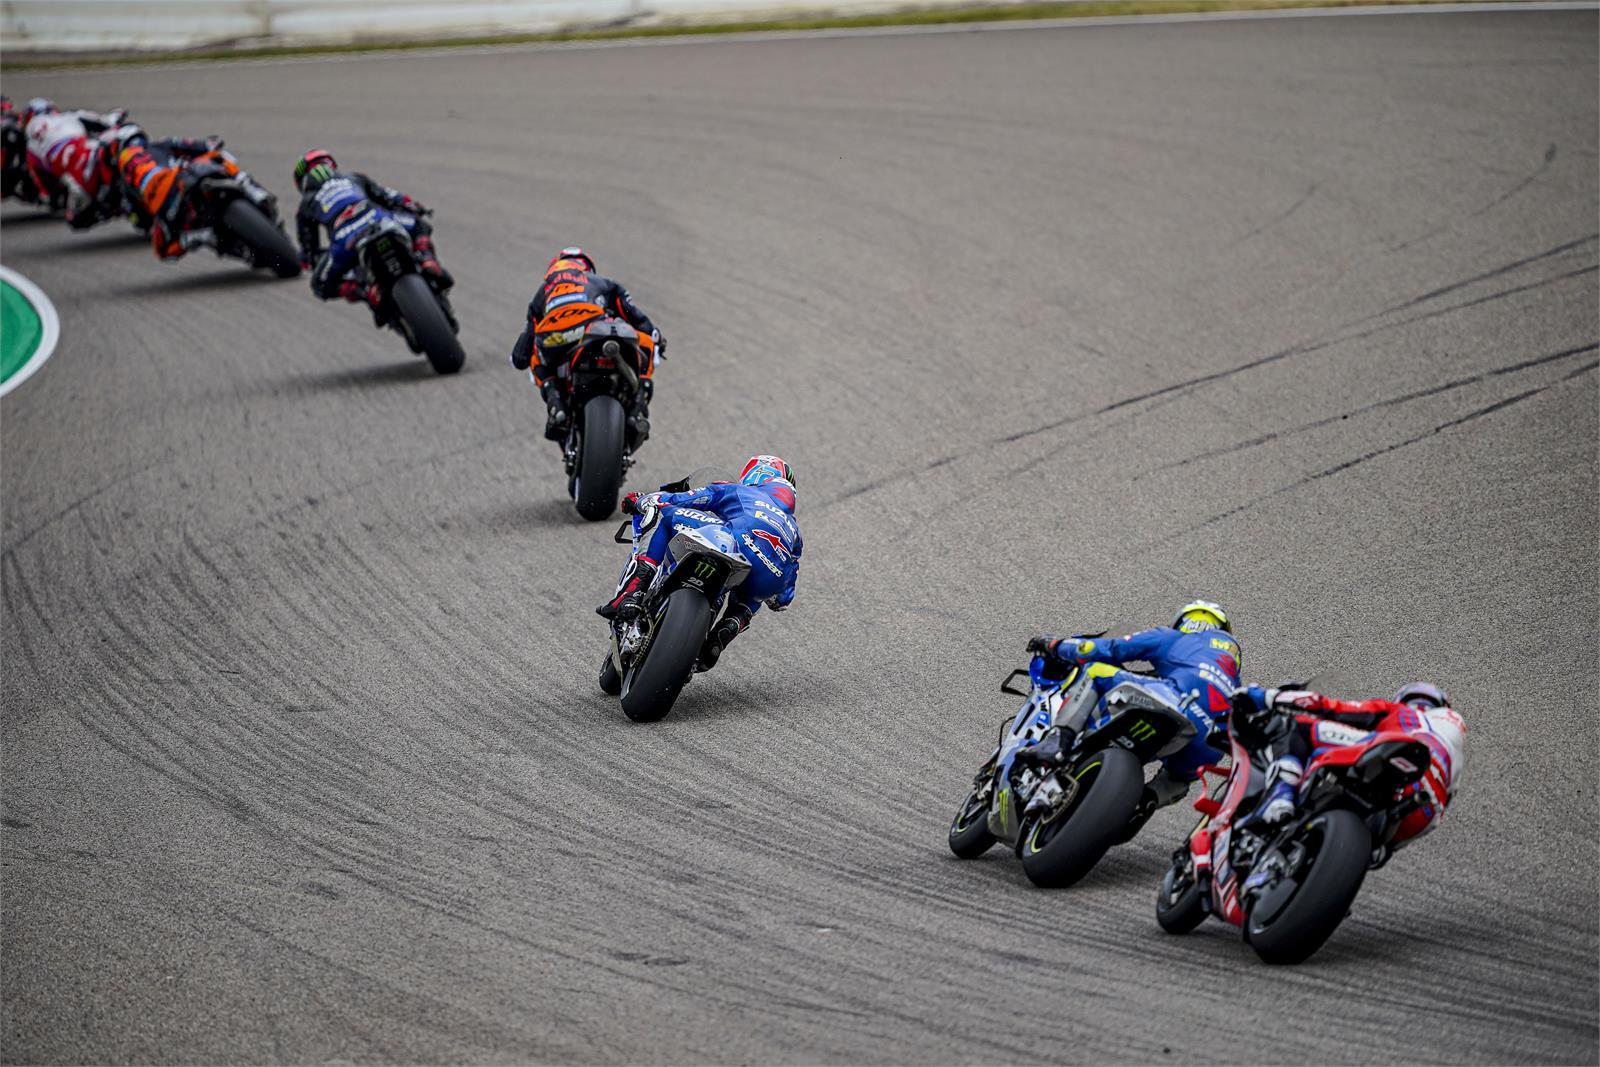 AMERICAS GP BACK ON THE 2021 MotoGP CALENDAR